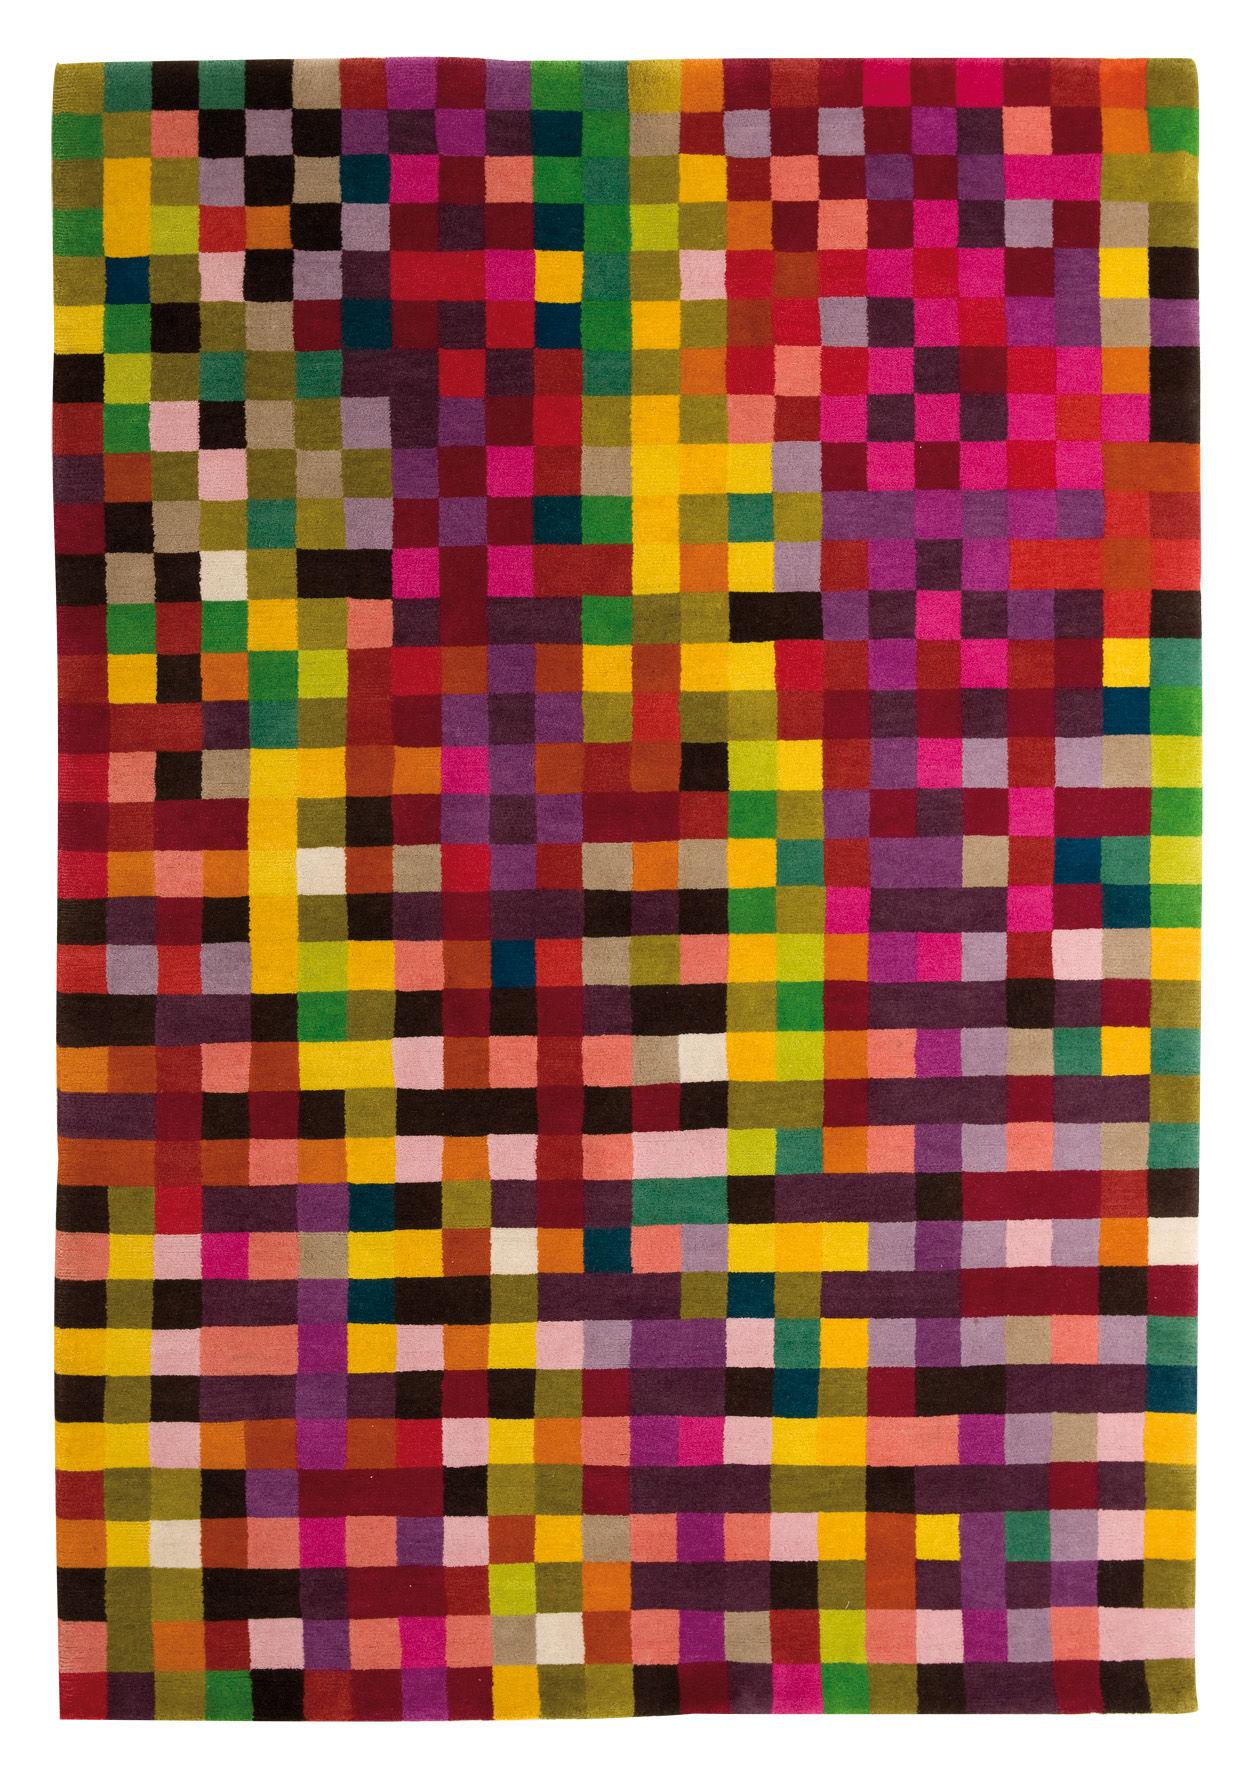 Mobilier - Tapis - Tapis Digit 1 170 x 240 cm - Nanimarquina - Tons vifs / 170 x 240 cm - Laine